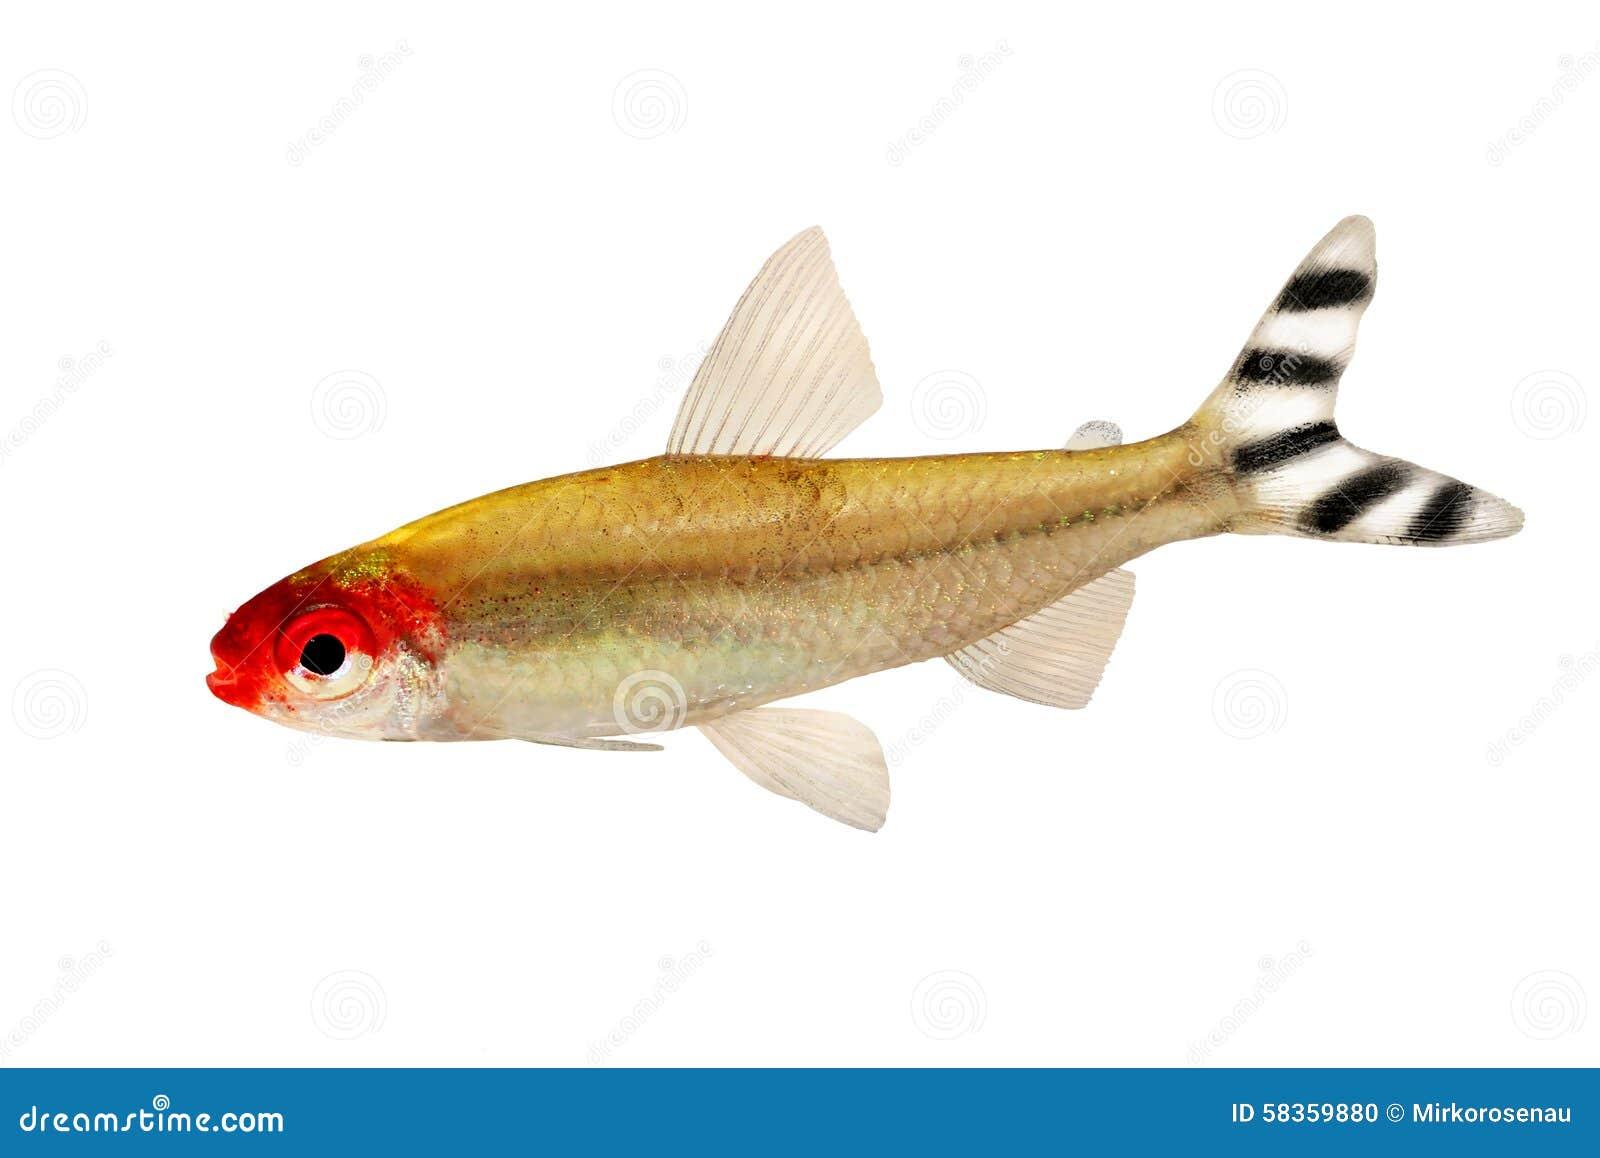 Freshwater aquarium fish rasbora - Aquarium Fish Rummy Nose Tetra Hemigrammus Rhodostomus Bleheri Freshwater Stock Photo